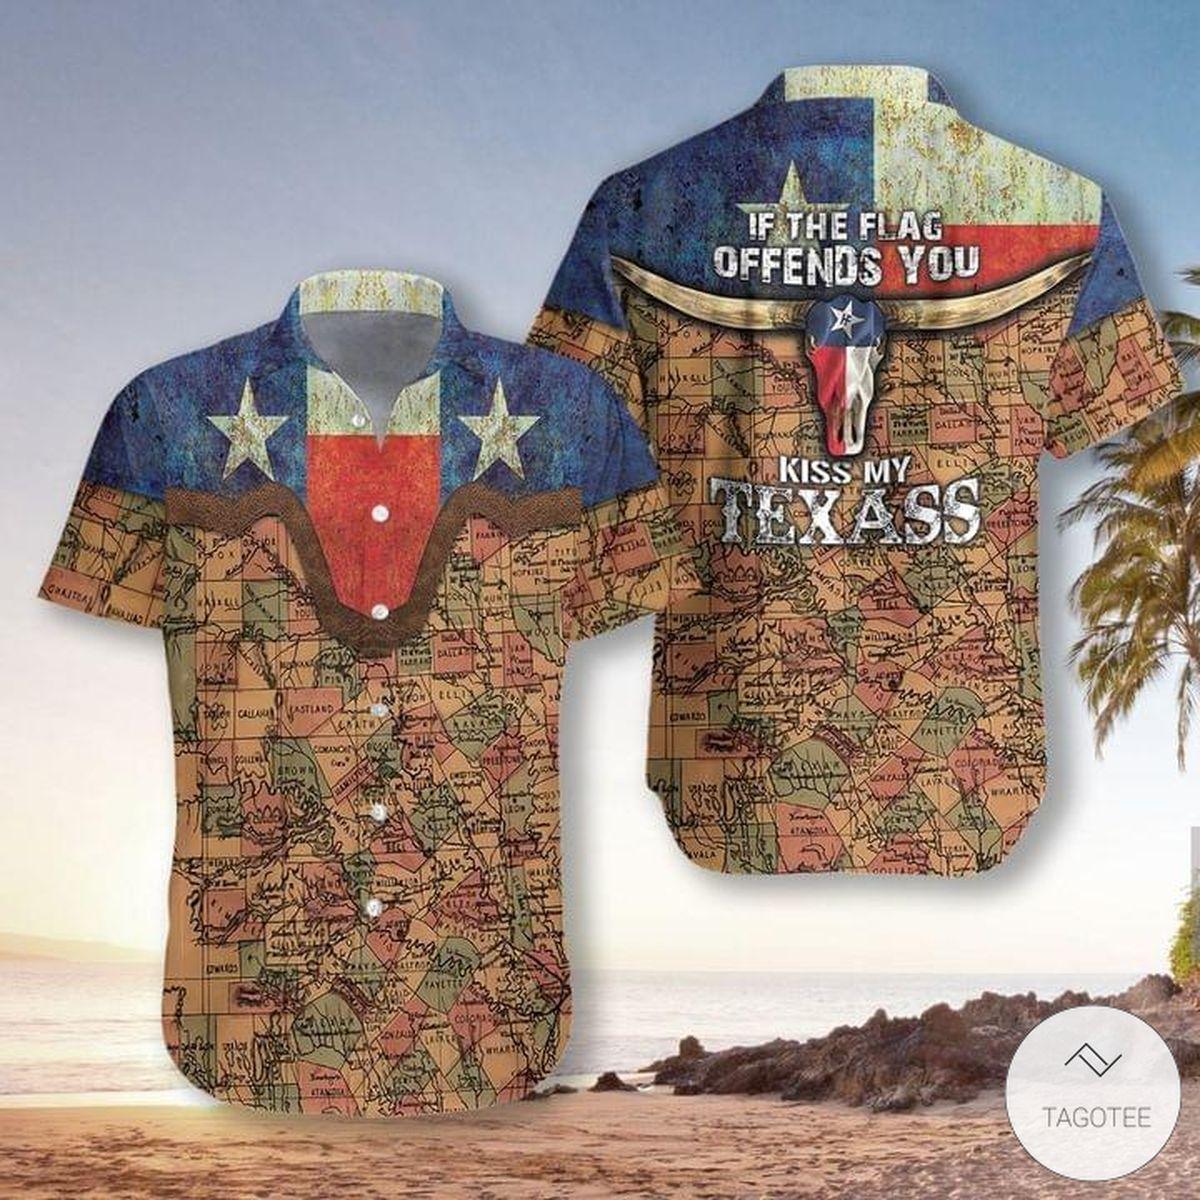 If the flag offends you kiss my Texas hawaiian shirt